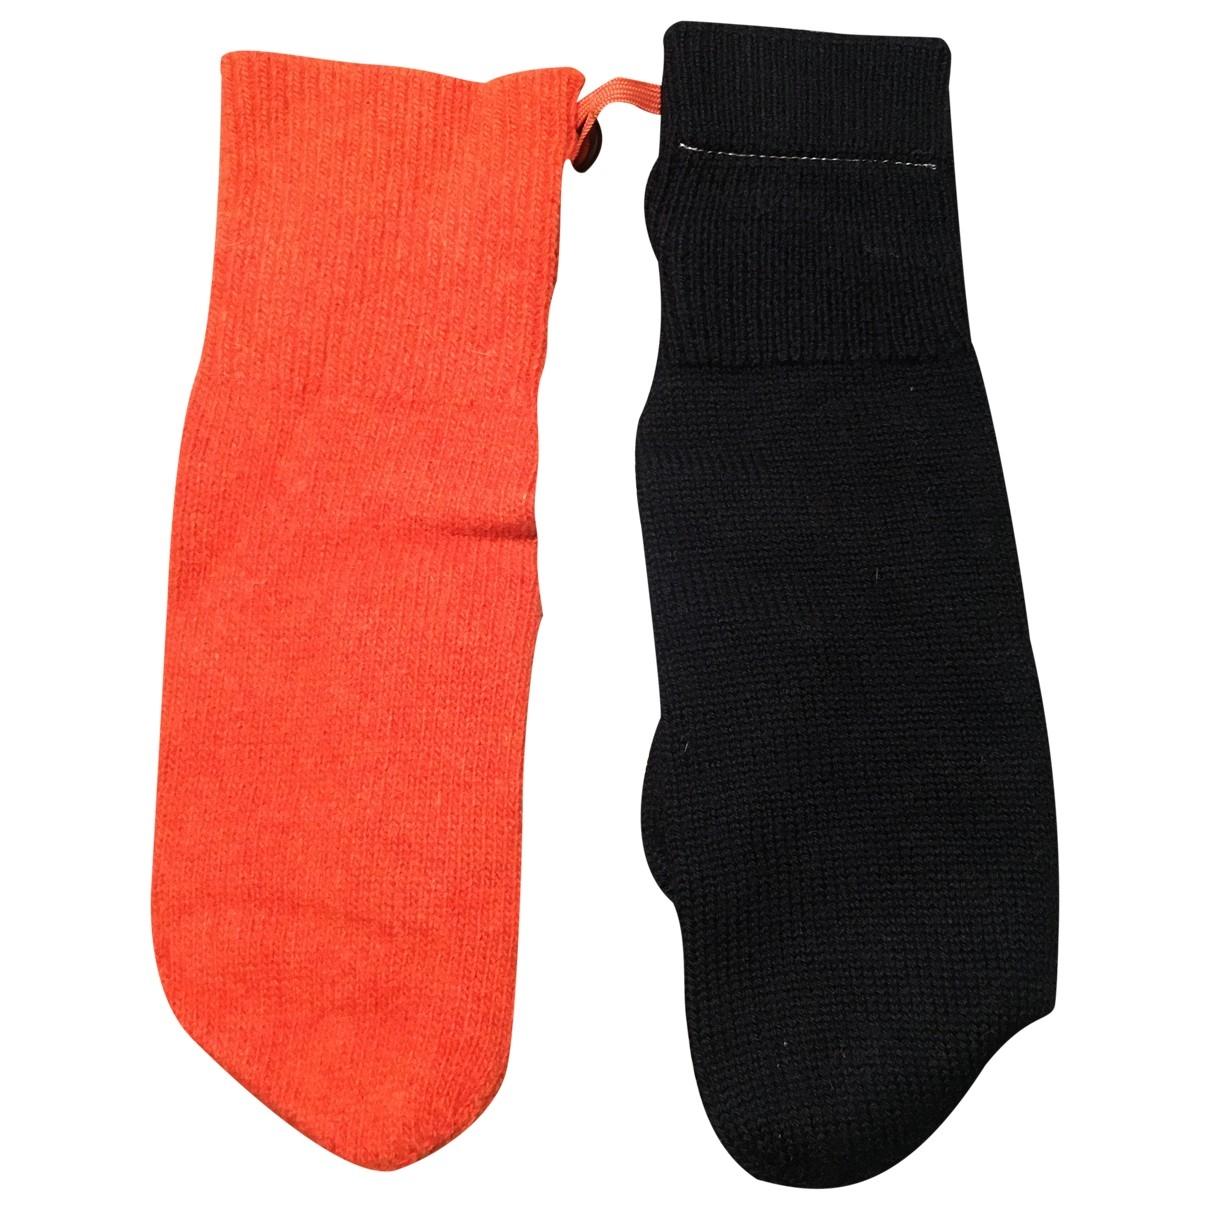 Mm6 \N Handschuhe in  Orange Wolle